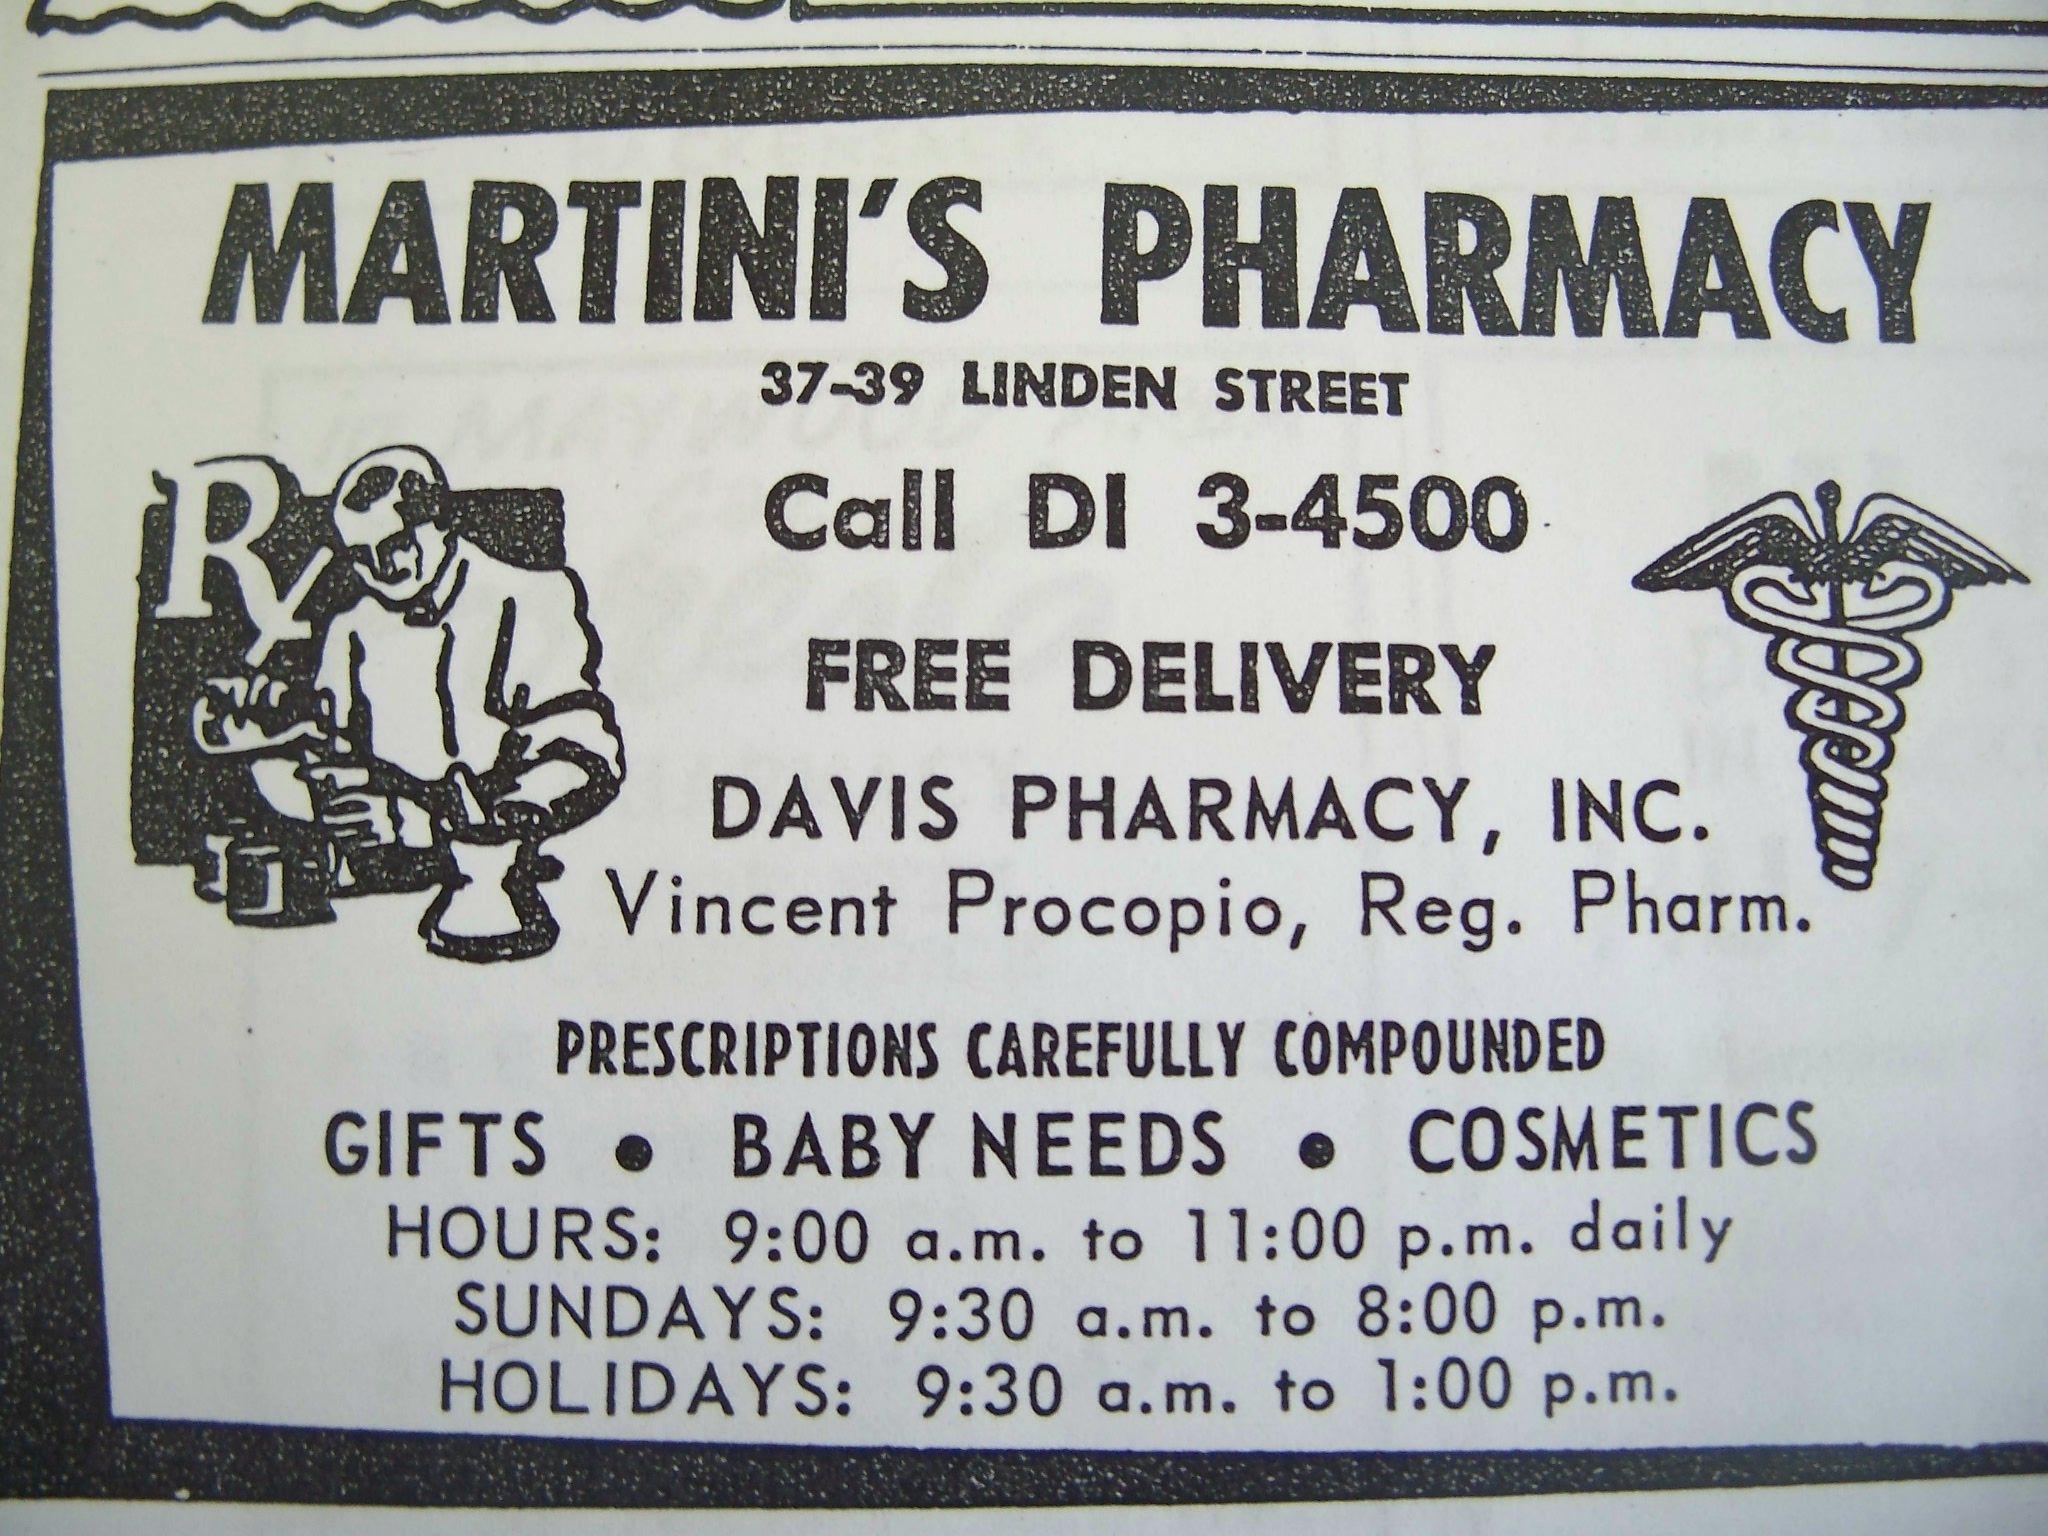 Martini's Pharmacy 37-39 Linden Street